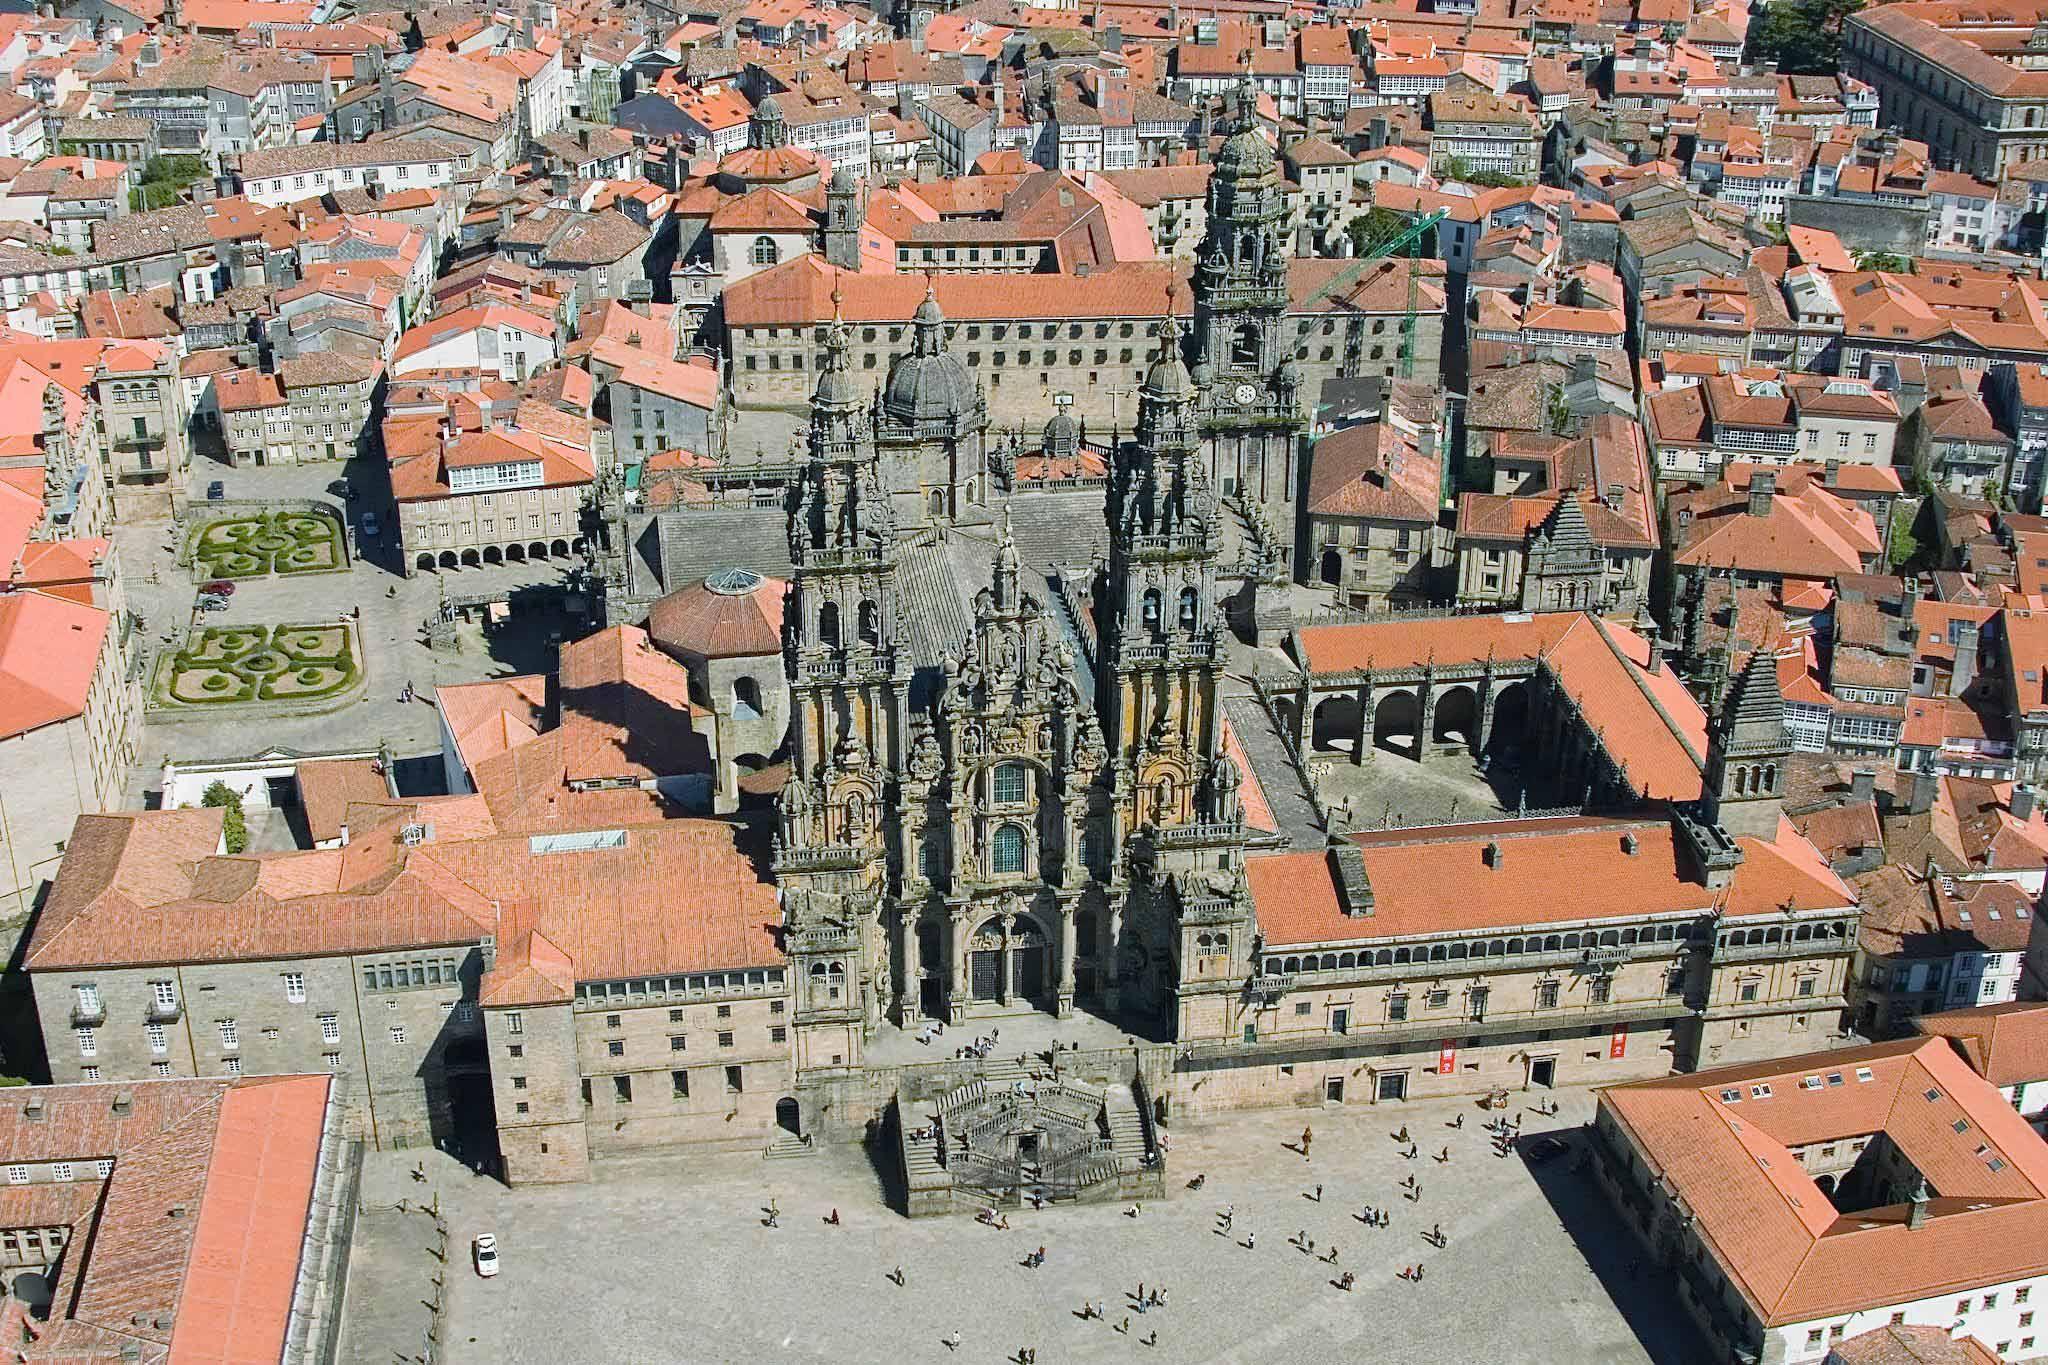 Catedral De Santiago Santiago De Compostela Catedral Camino De Santiago Francés